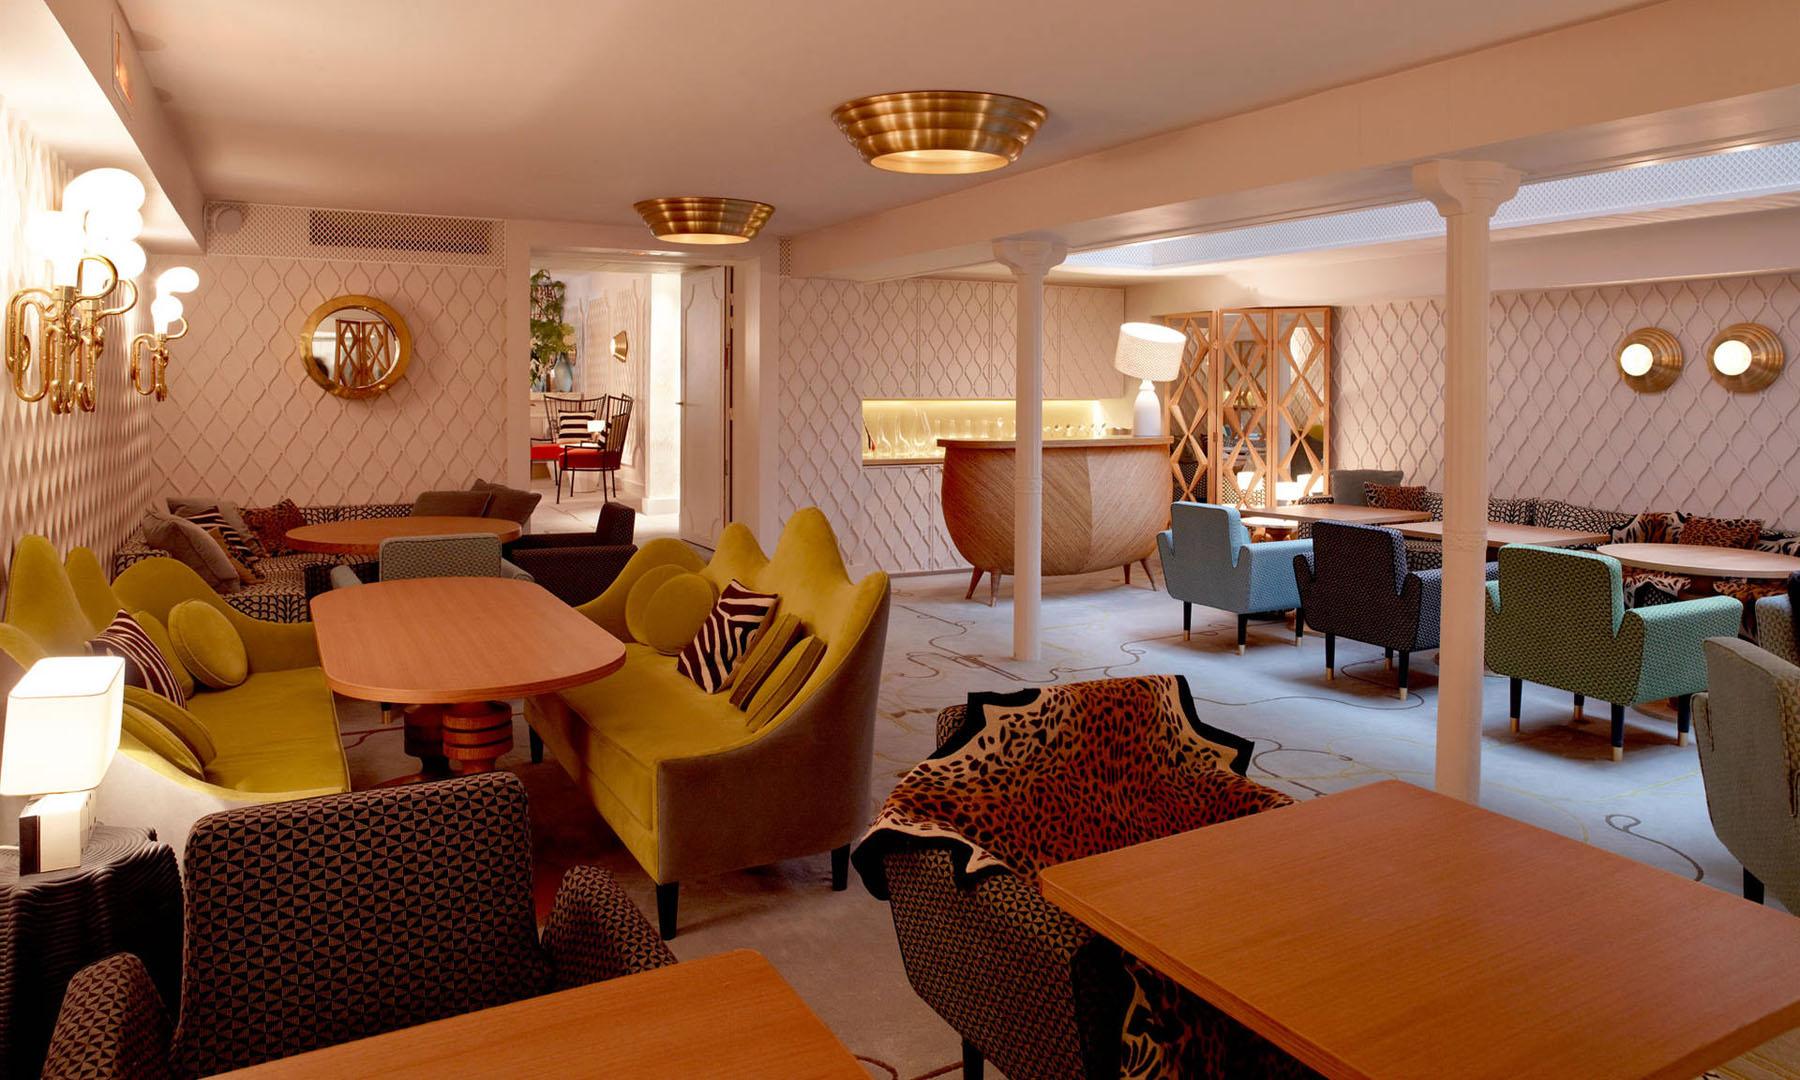 French Art Deco Interior Design By India Mahdavi At Hotel ...